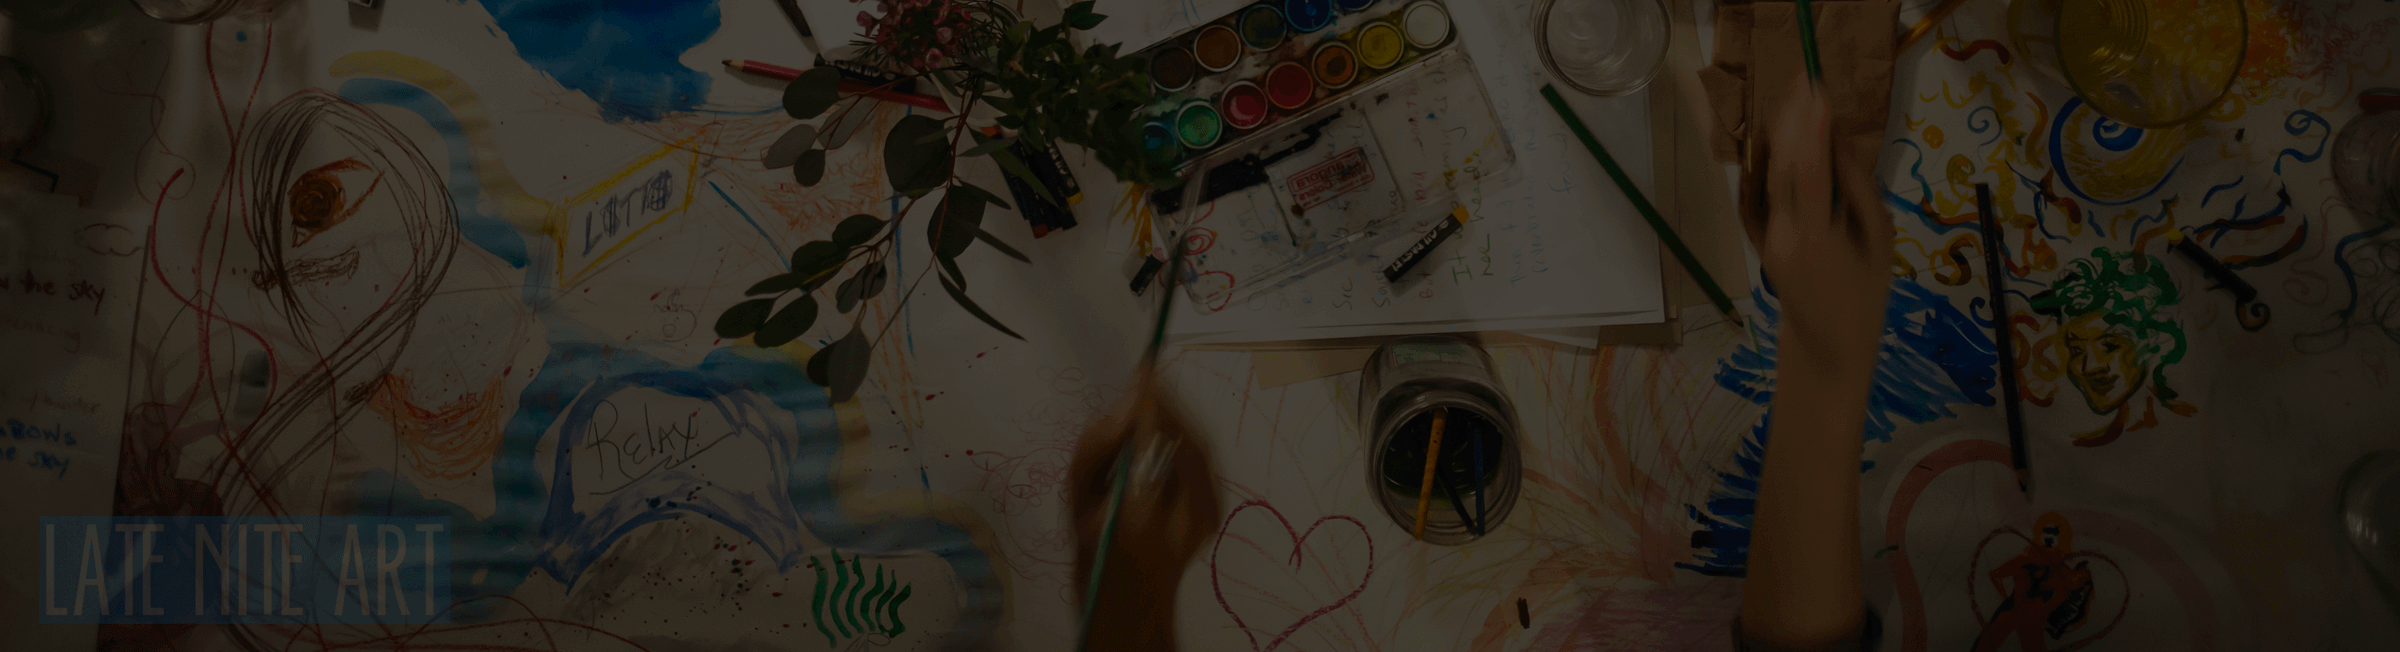 What's creative facilitation? -